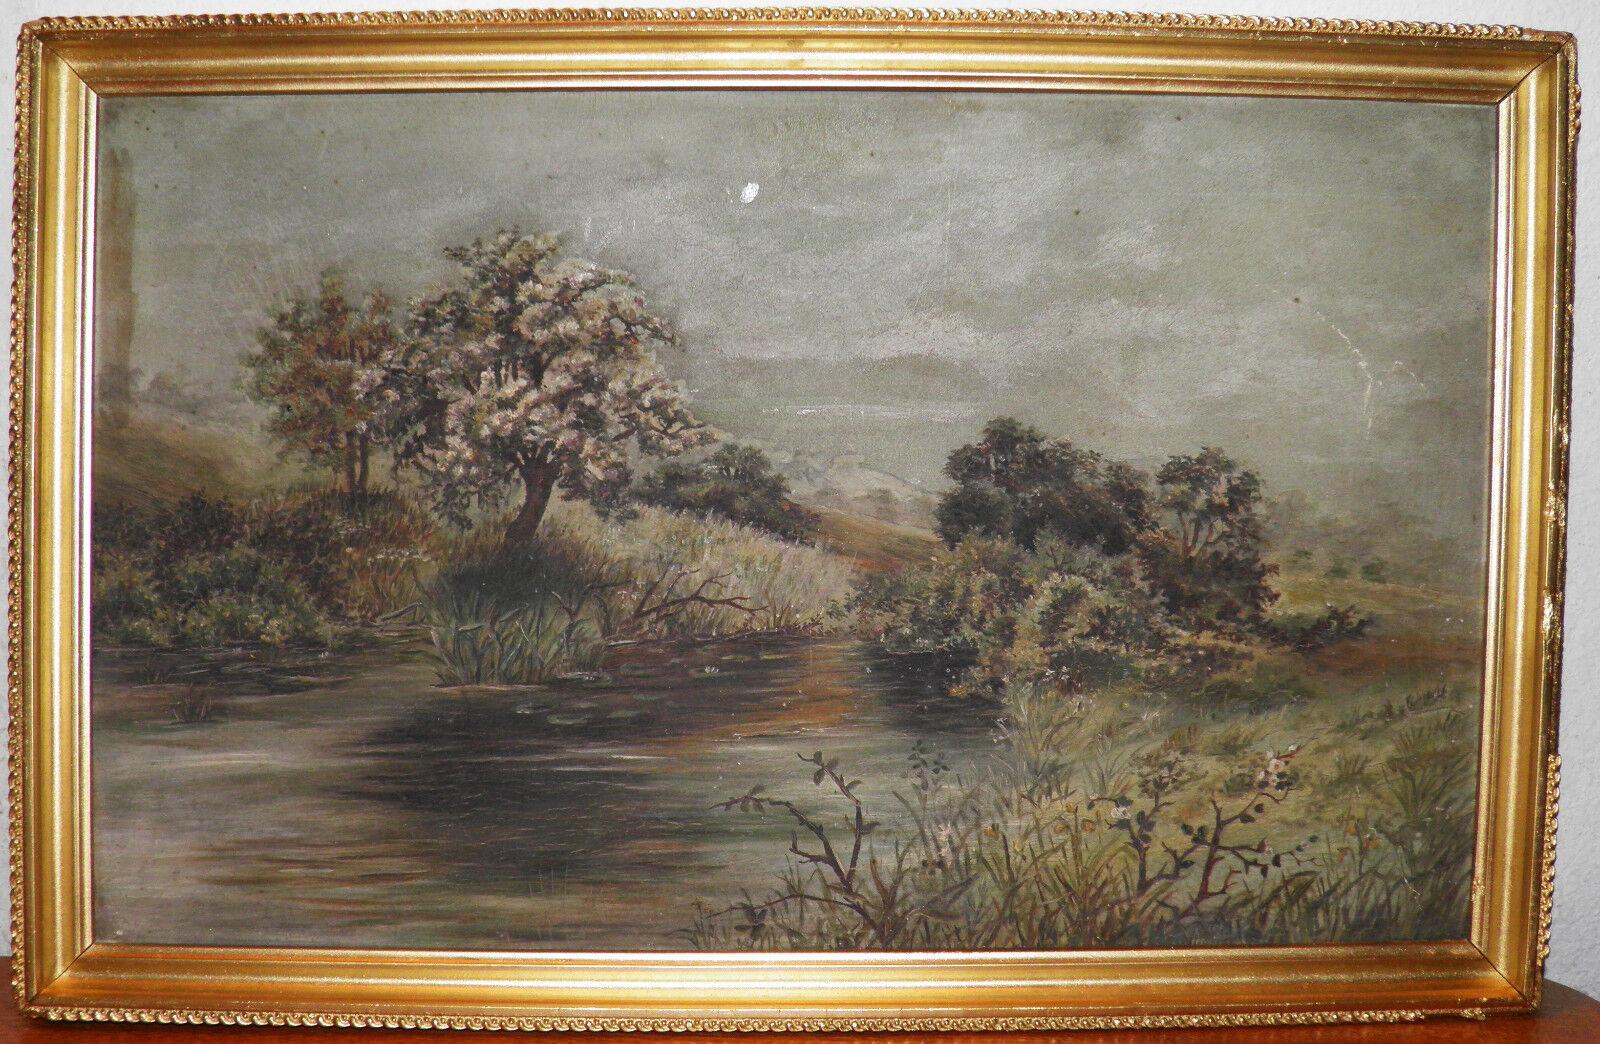 Original 1800 s Oil On Board Painting Iconic Landscape Scene Framed 40.00 OFF - $138.84